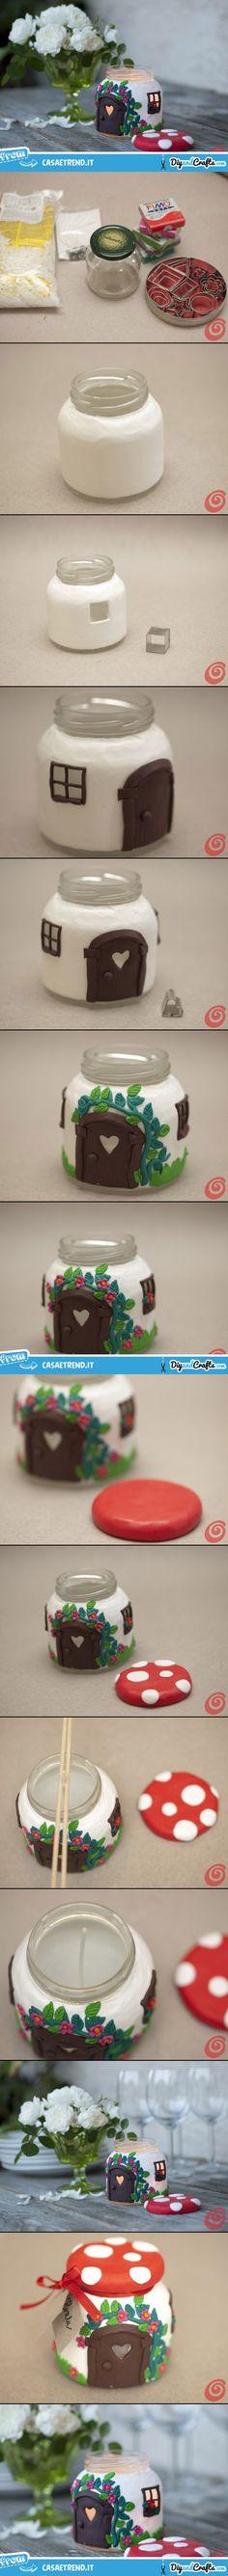 Glass Jar Mushroom - candle House | DIY